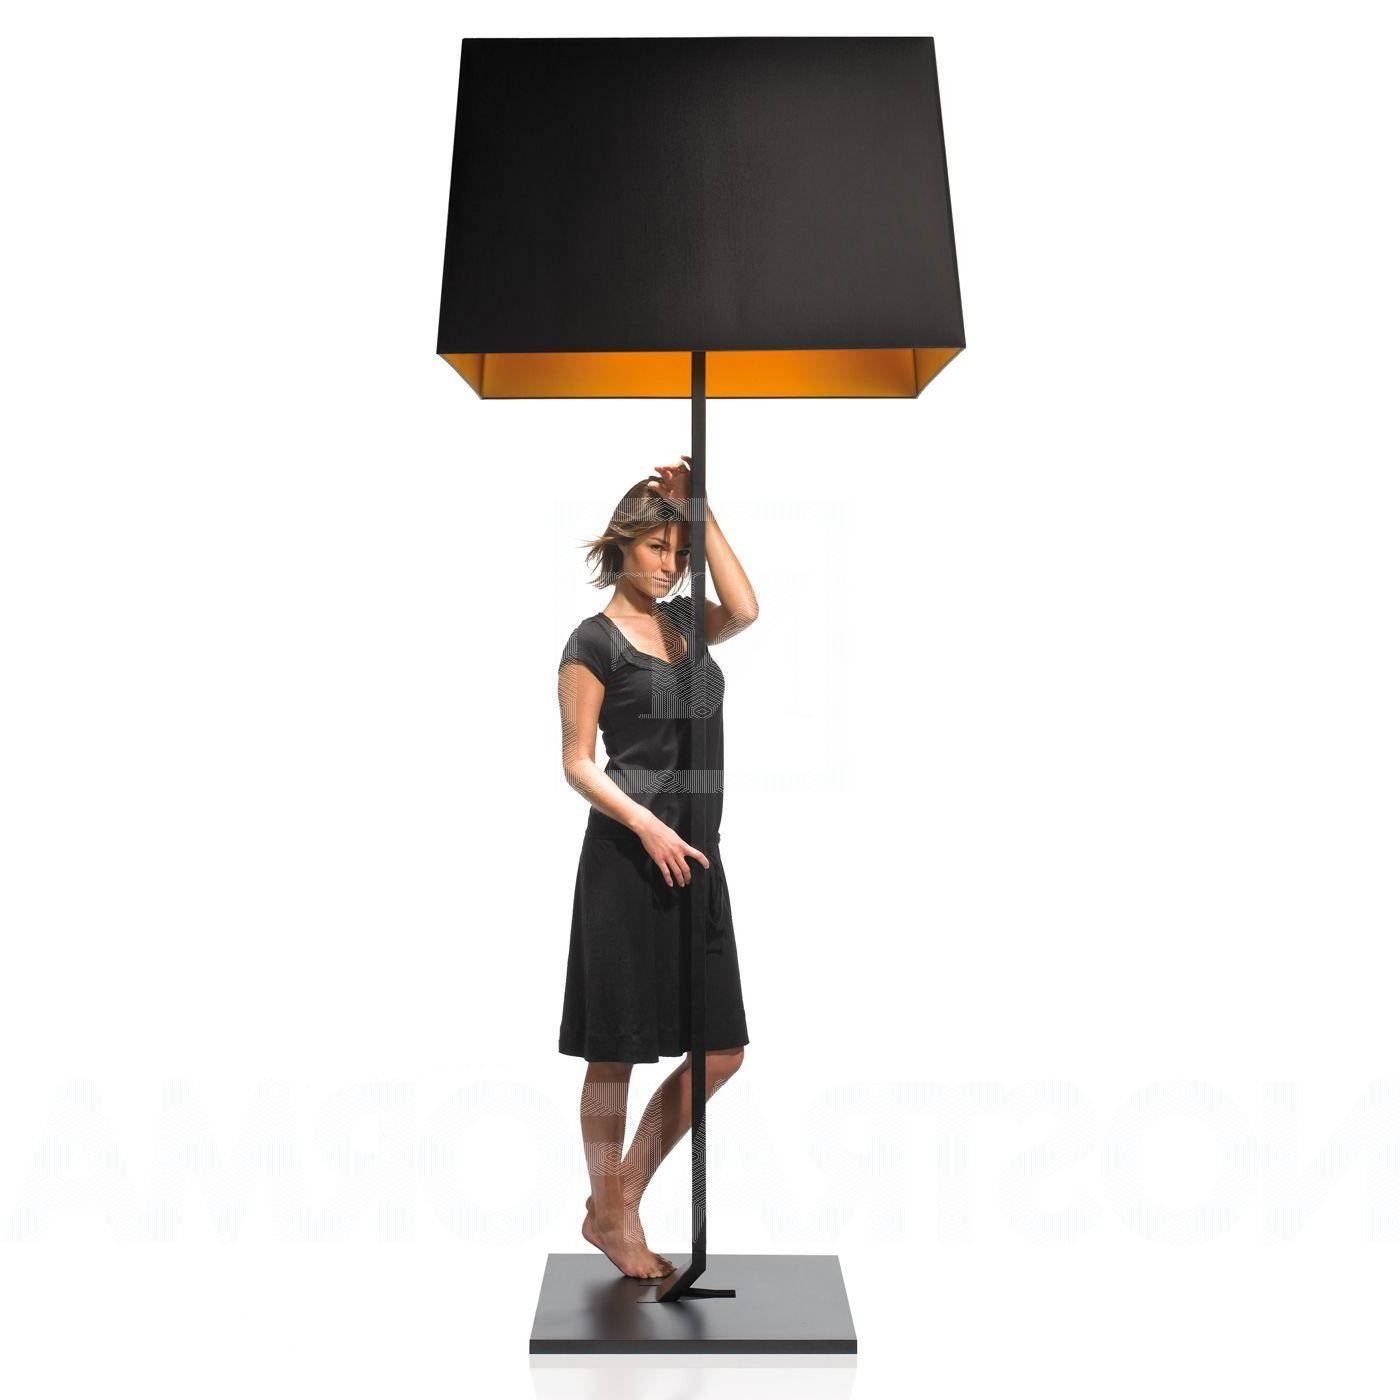 Lighting Black Oversized Floor Lamp With Black Cube Lampshade Design Italian Jumbo Lamps Oversized Floor Lamp Floor Lamp Shades Black Floor Lamp